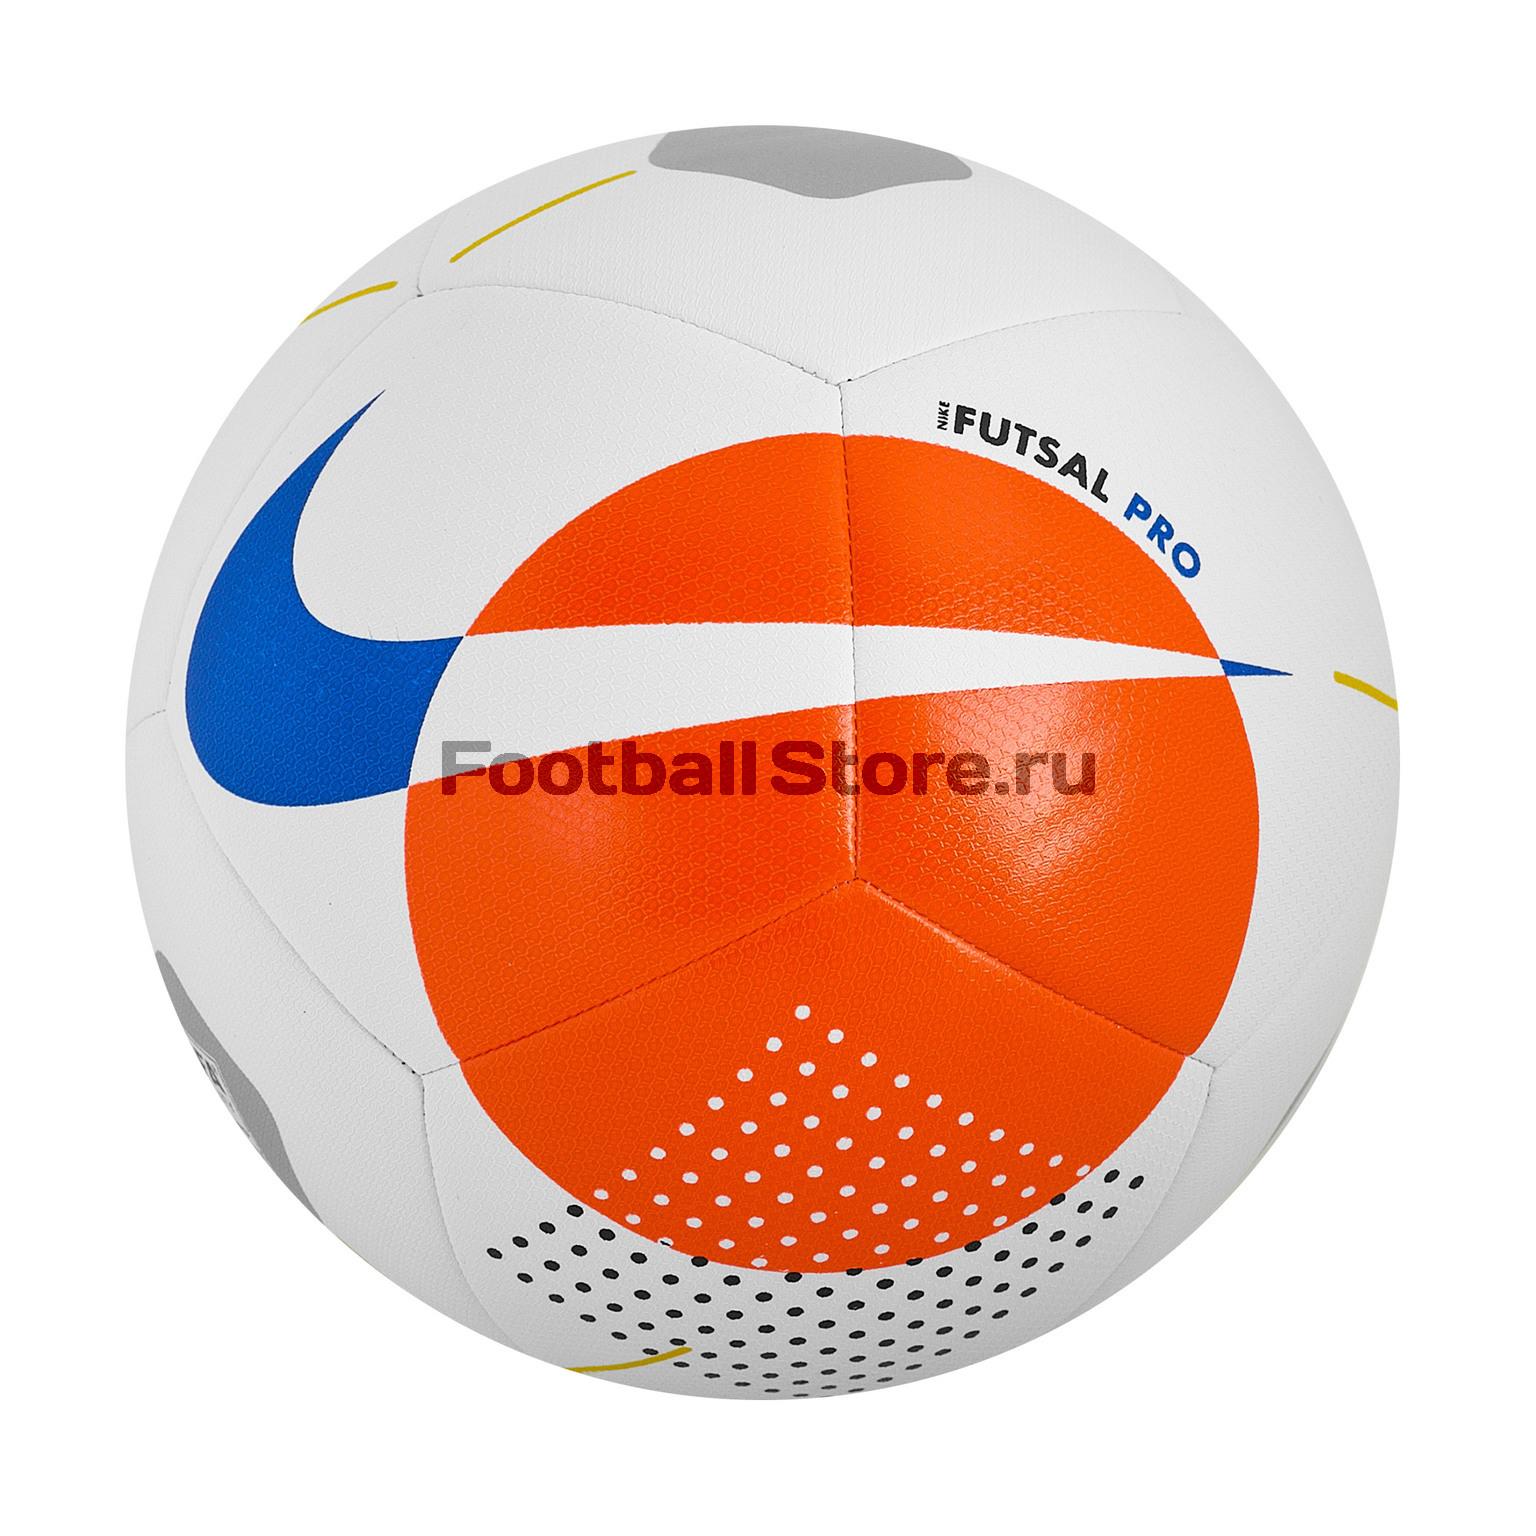 Футзальный мяч Nike Futsal Pro SC3971-100